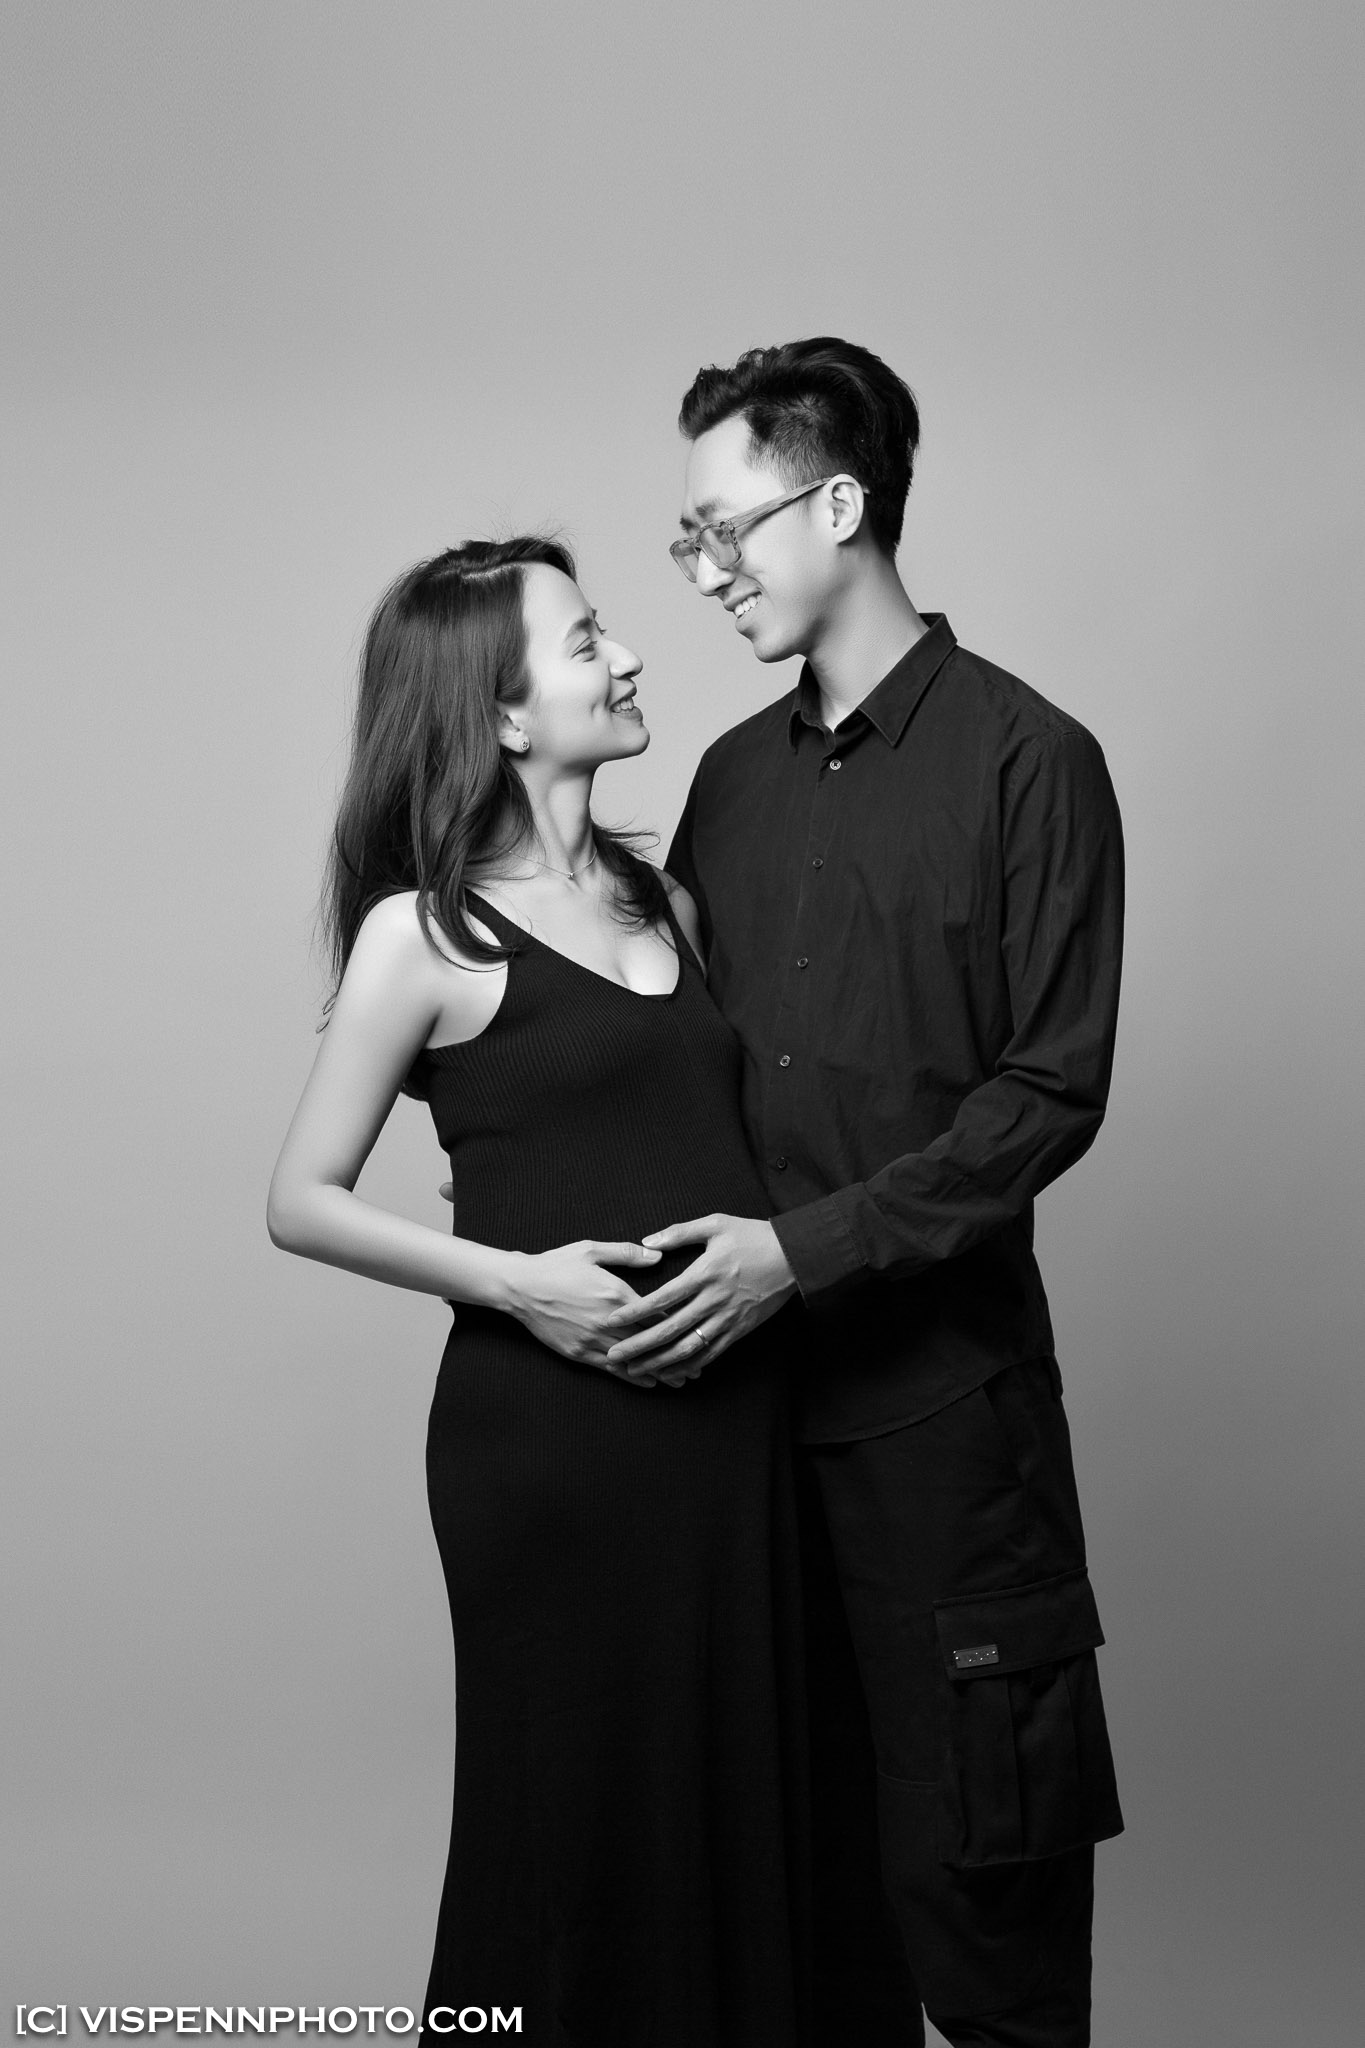 Melbourne Newborn Baby Maternity Family Photo VISPENN 墨尔本 孕妇照 大肚照 FionaLIANG 2264 VISPENN